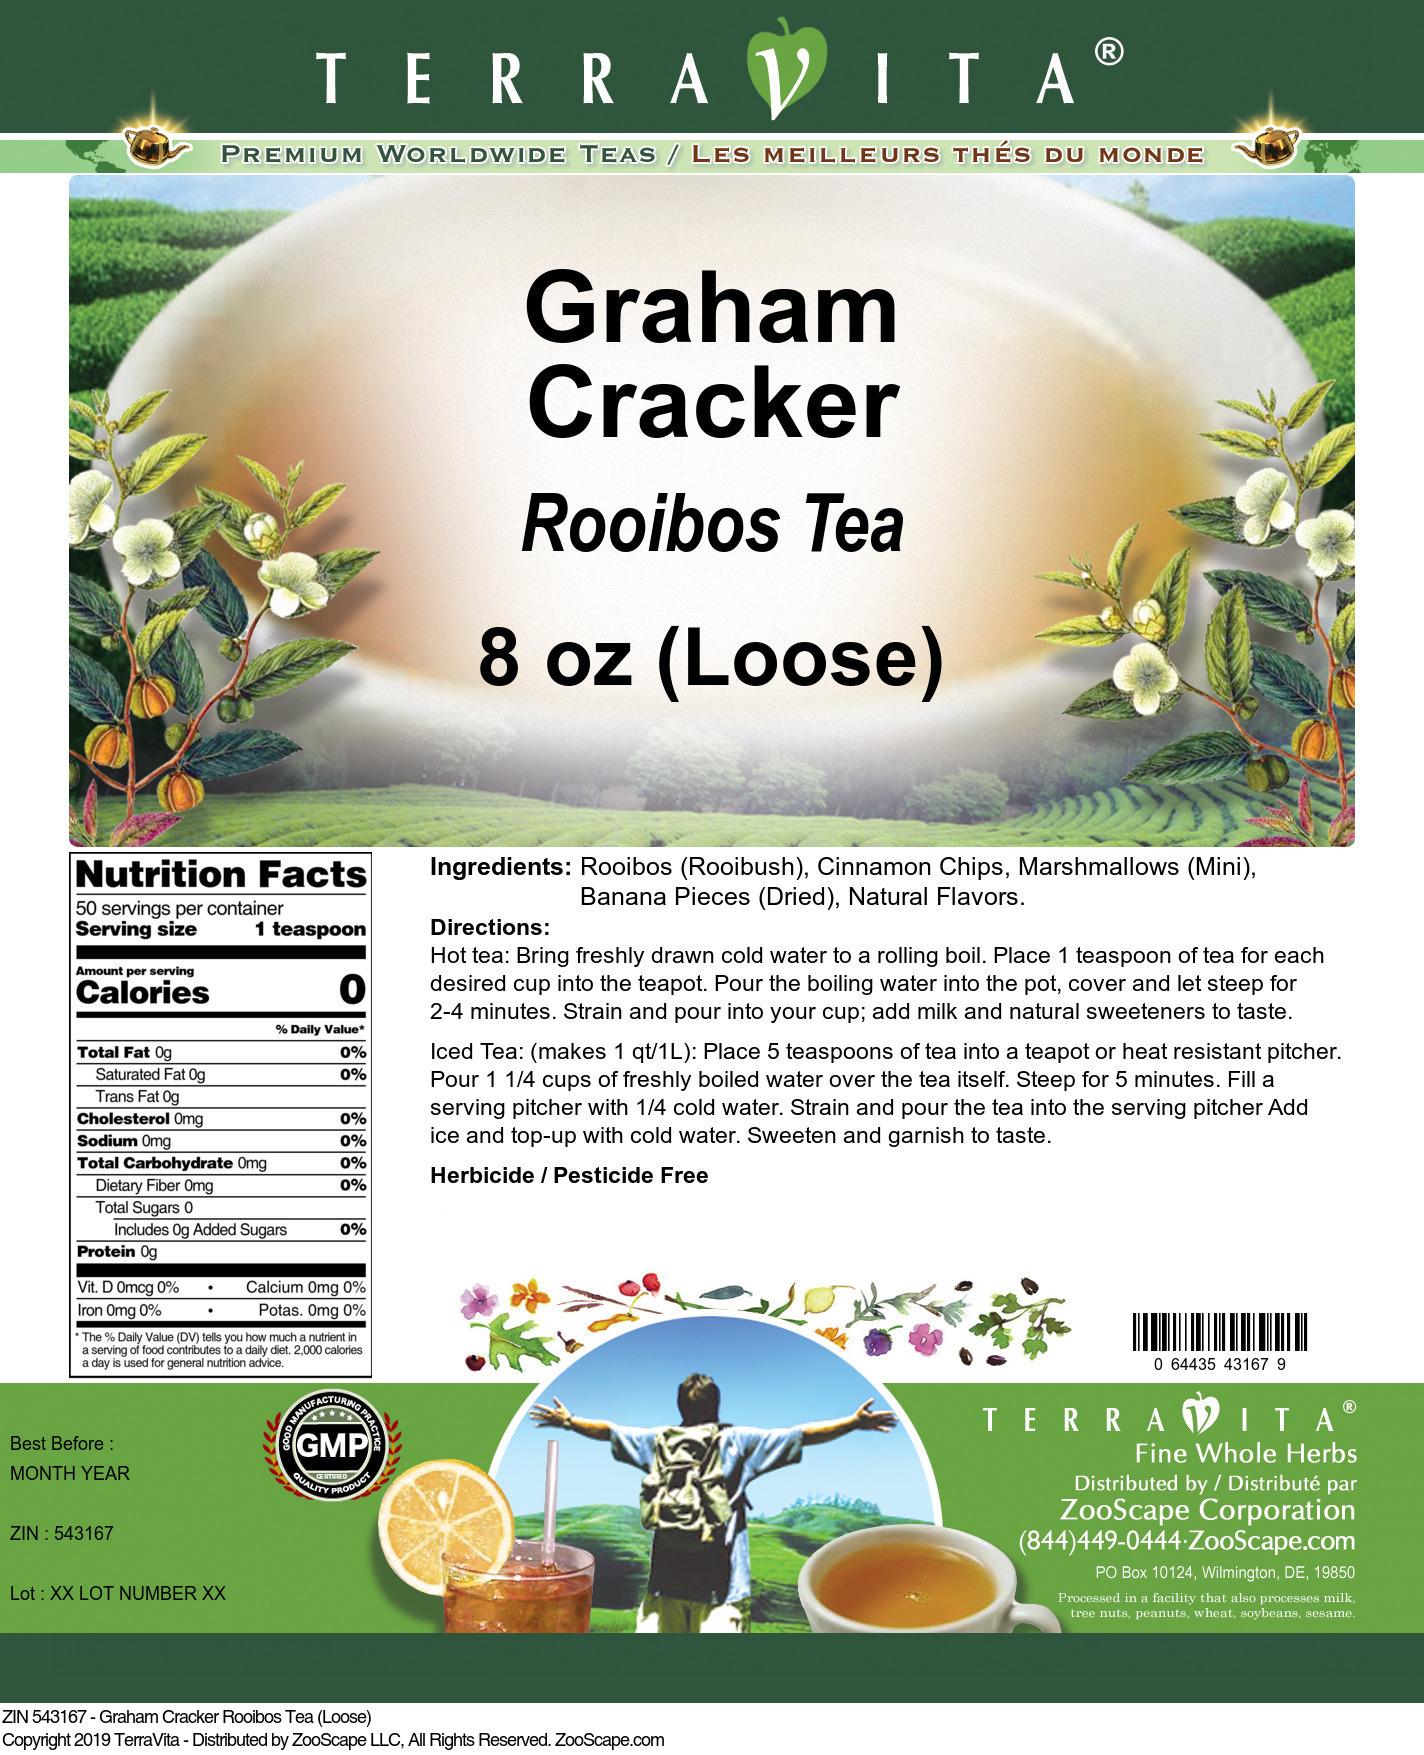 Graham Cracker Rooibos Tea (Loose)